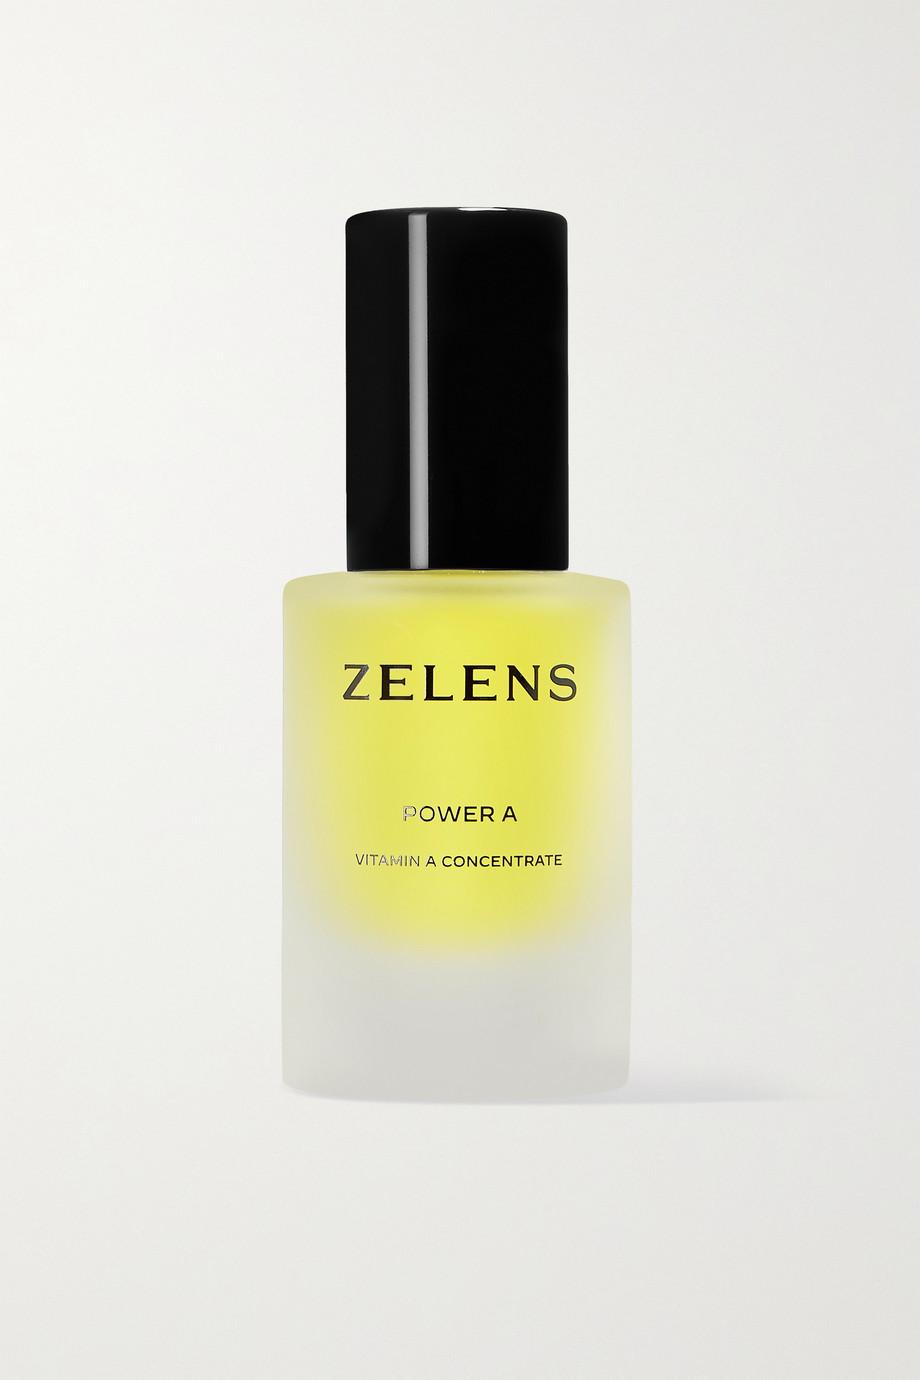 Zelens Power A High Potency Vitamin A Treatment Drops, 30ml